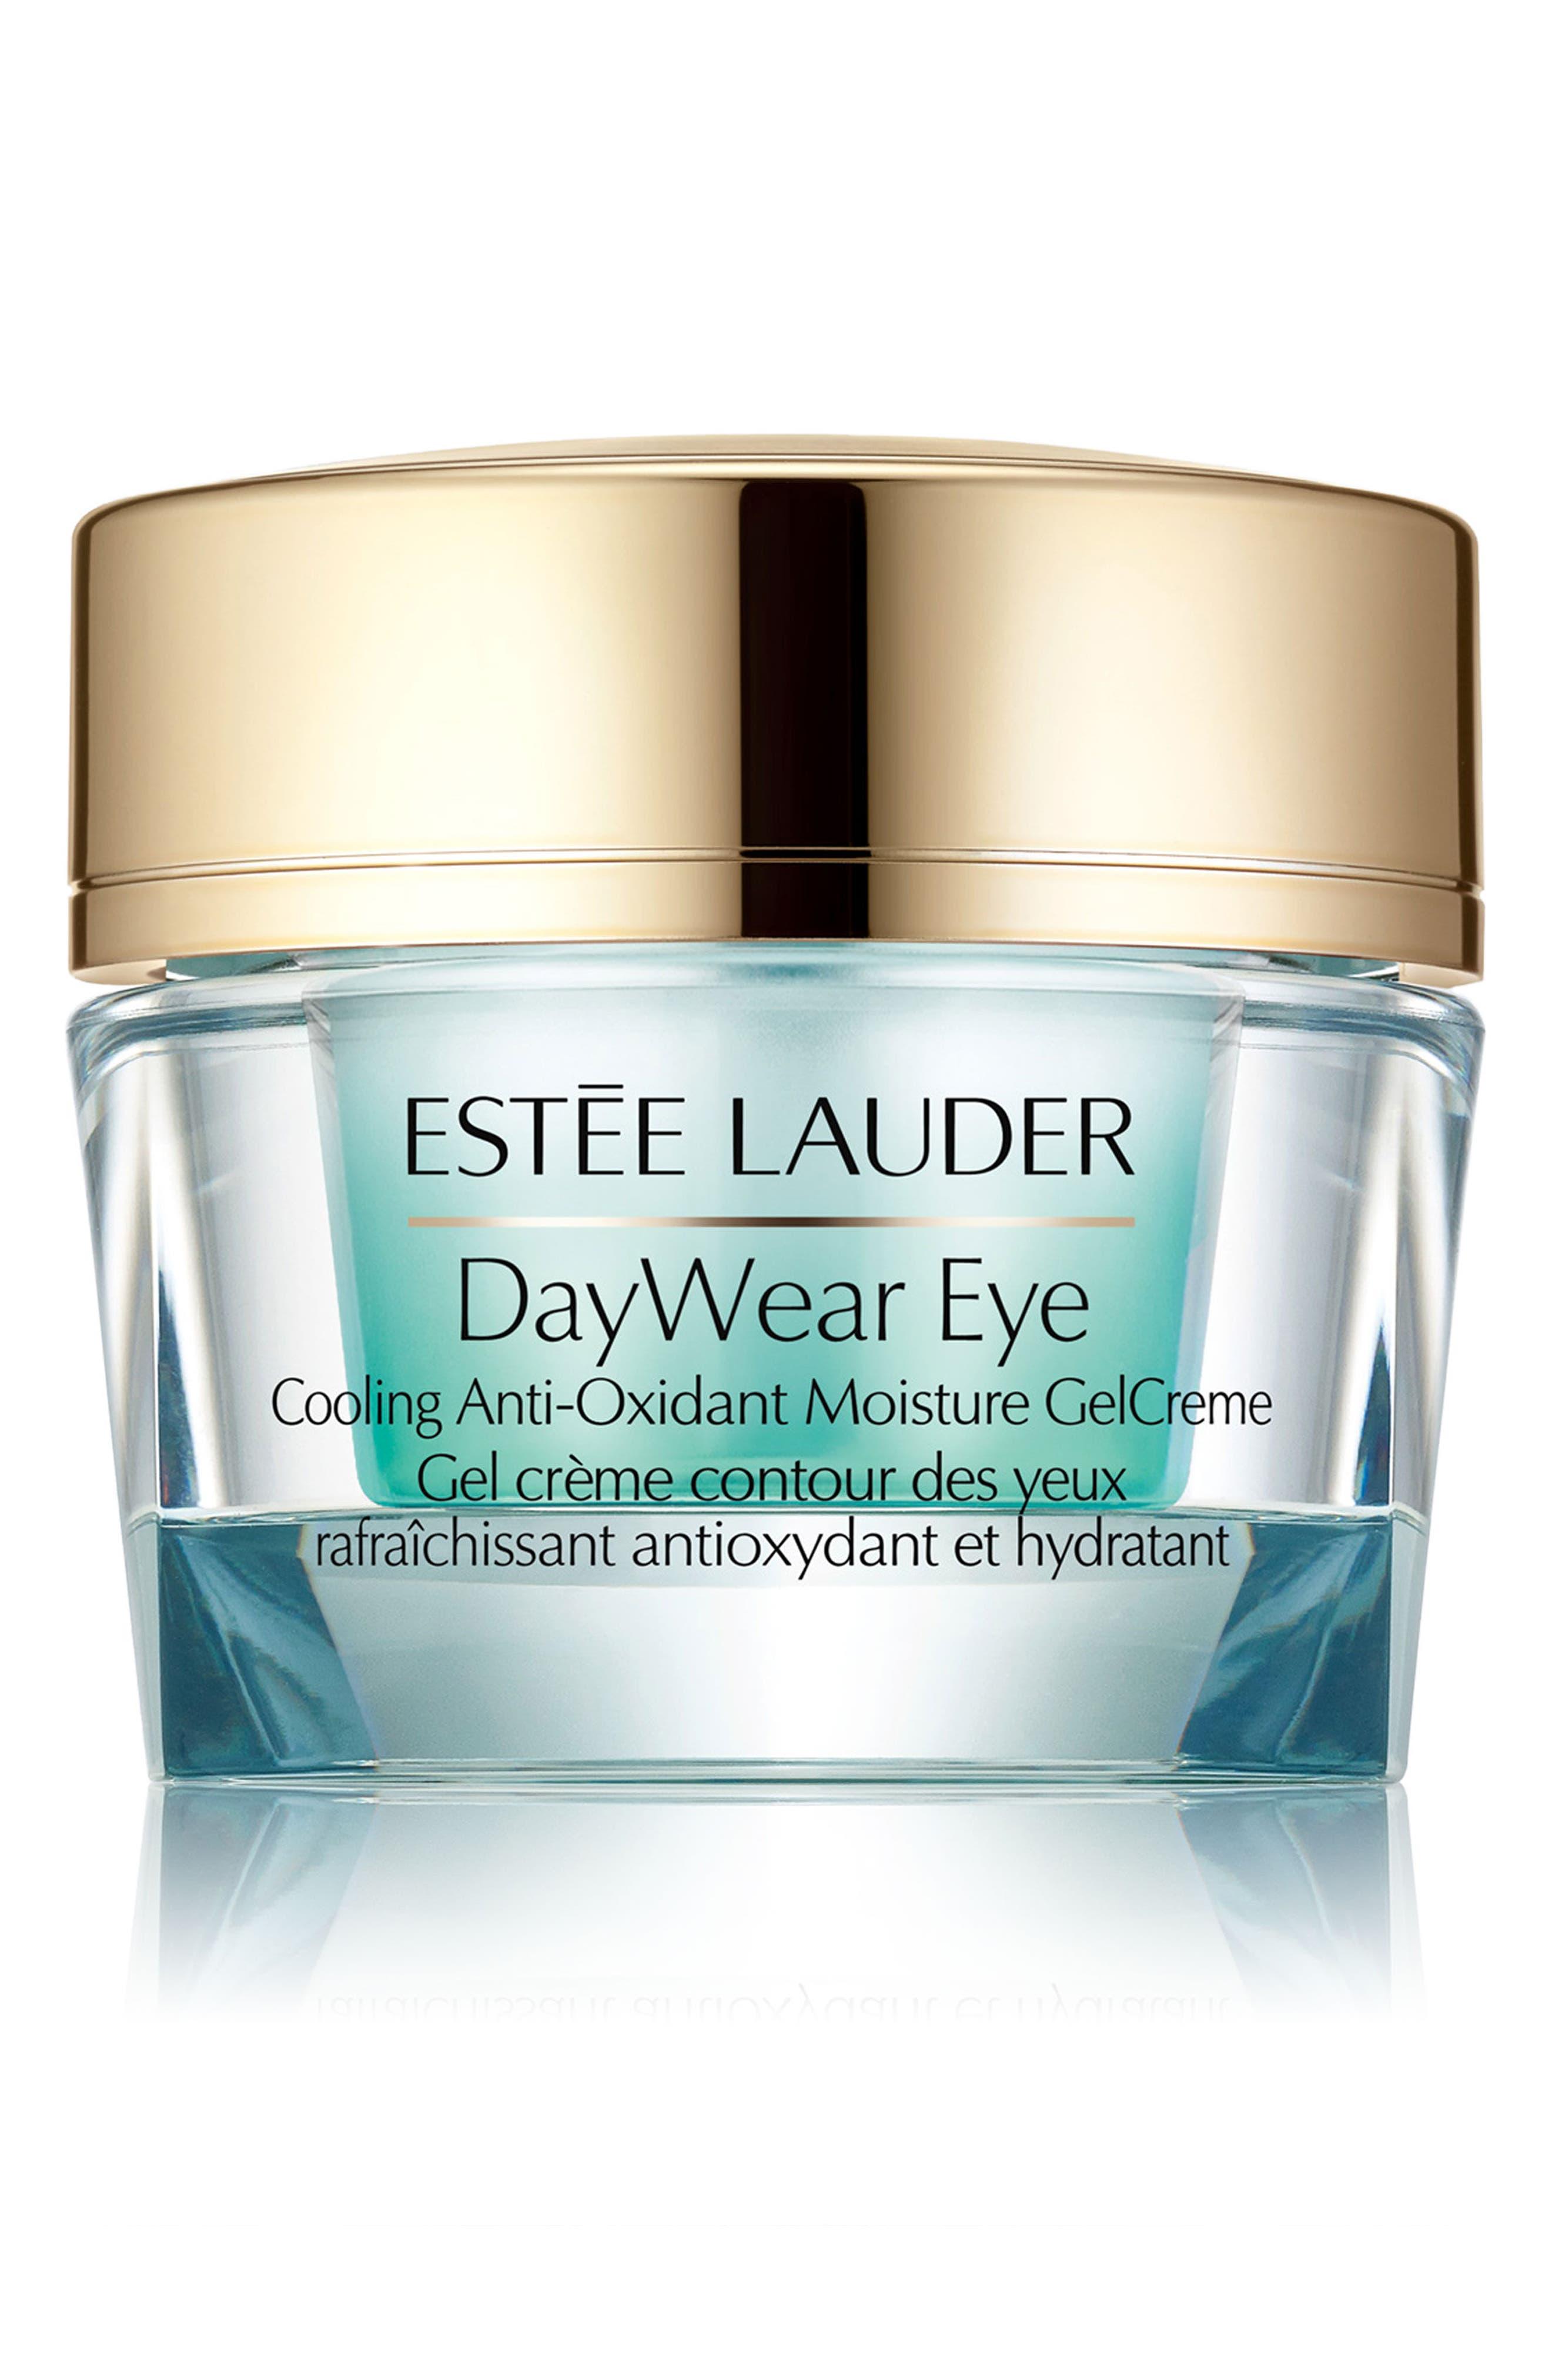 Estée Lauder DayWear Eye Cooling Antioxidant Moisture Gel Crème